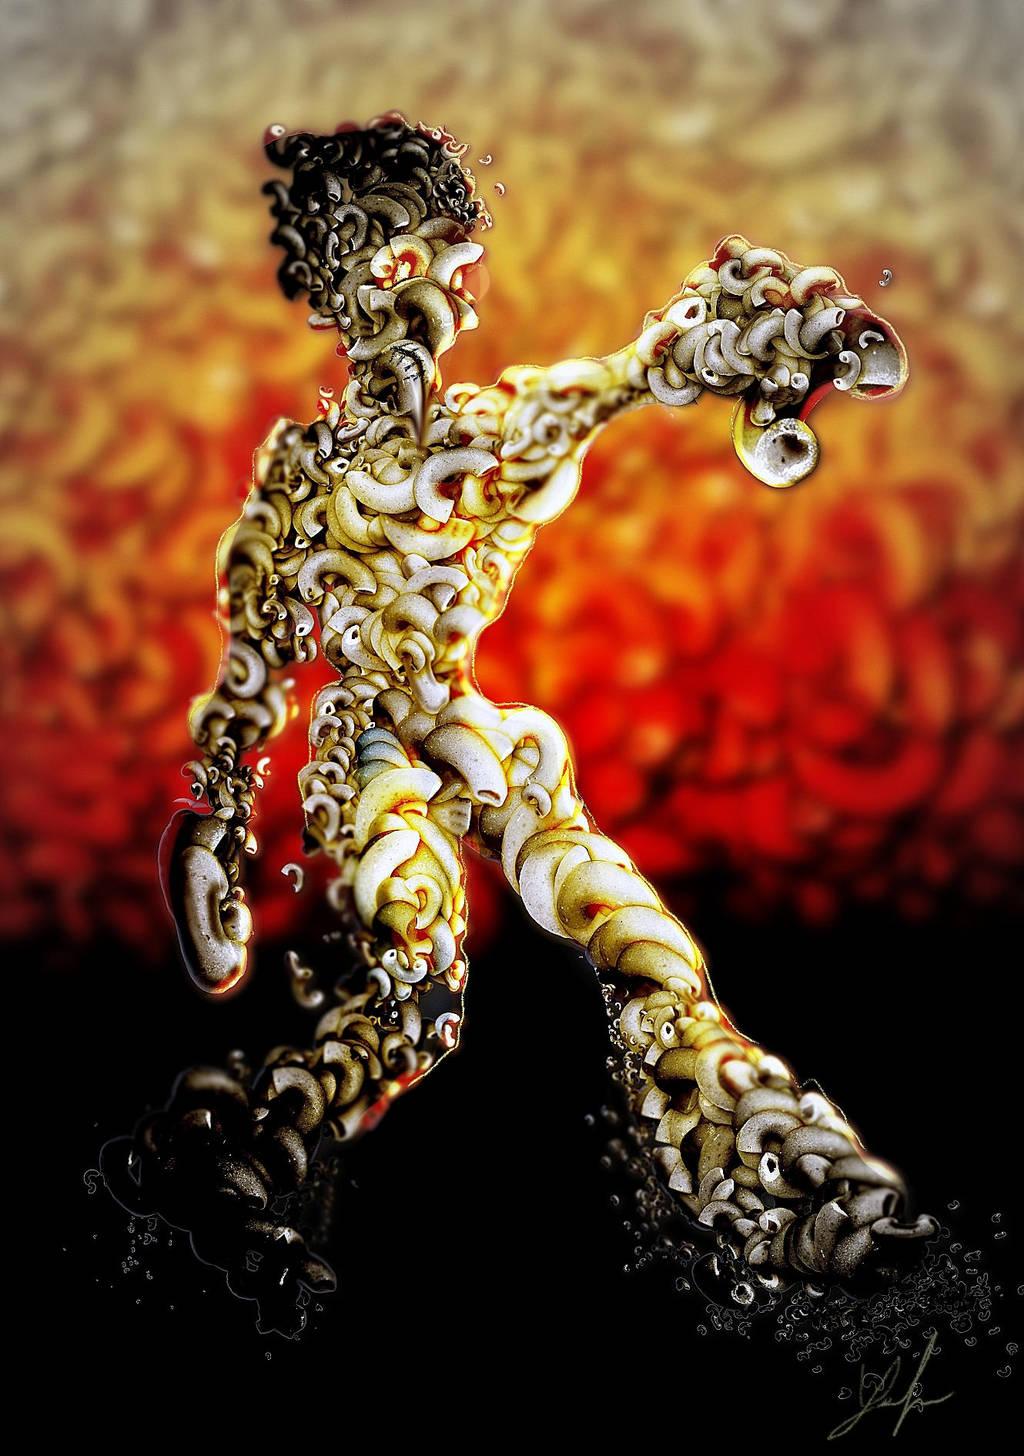 Macaroni Man by RedSaucers